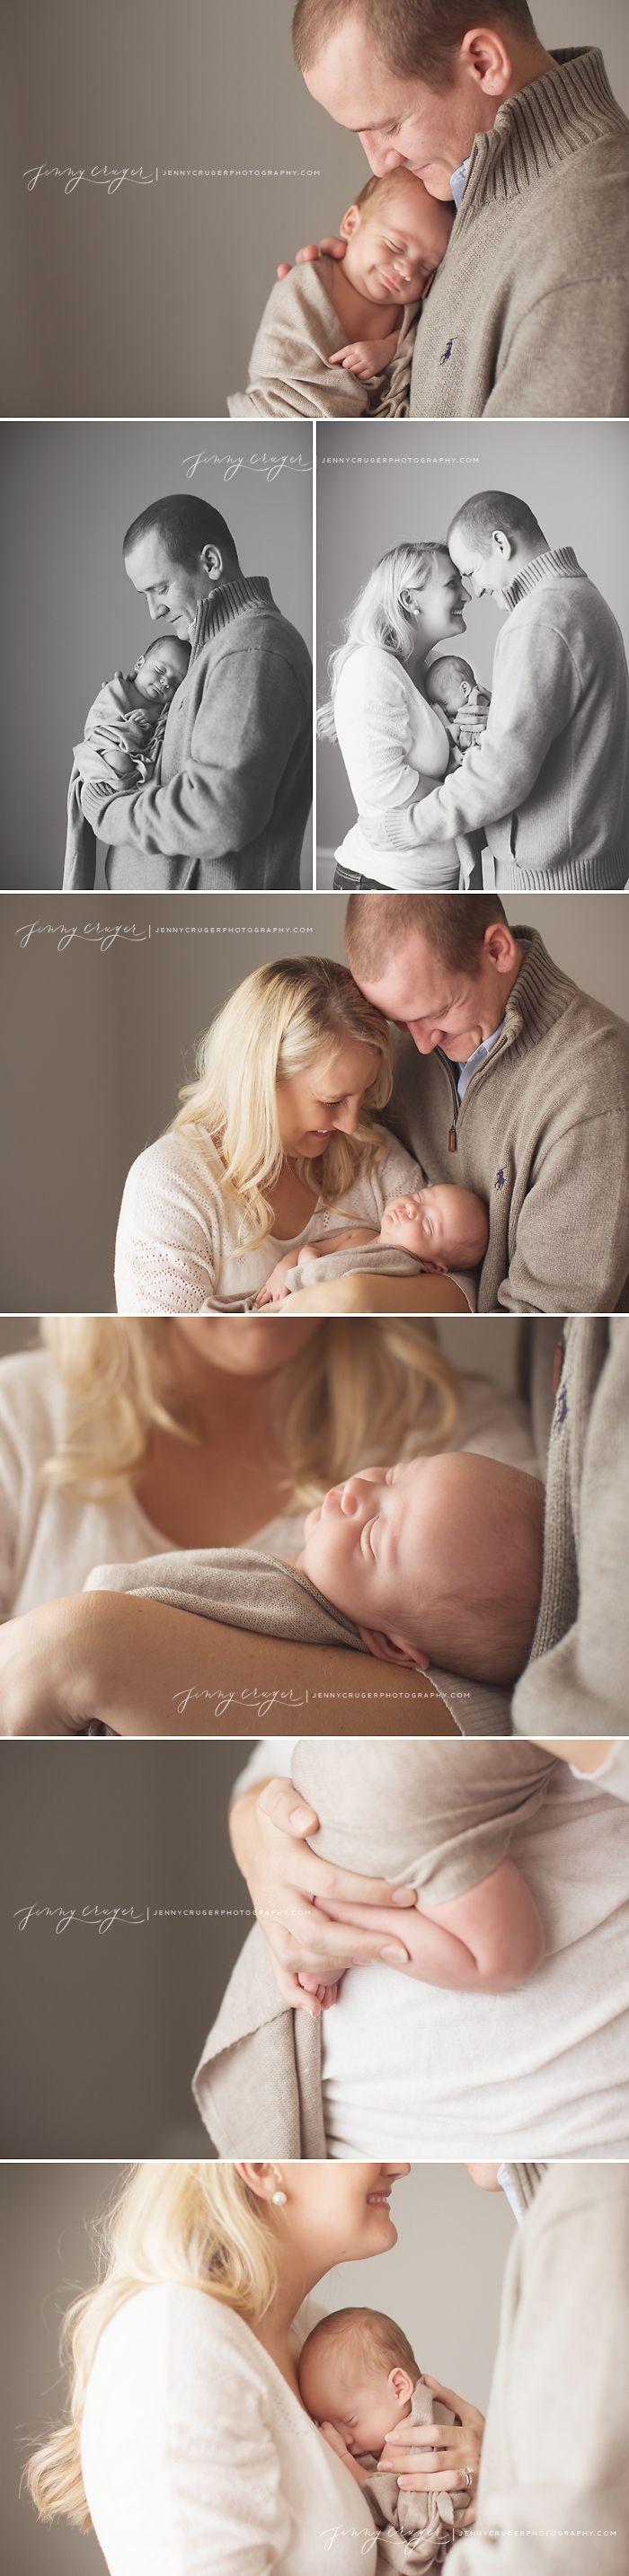 newborn photography nashville . jack - Jenny Cruger Photography | Nashville Newborn Photographer | Babies | Maternity | Families | Children ...